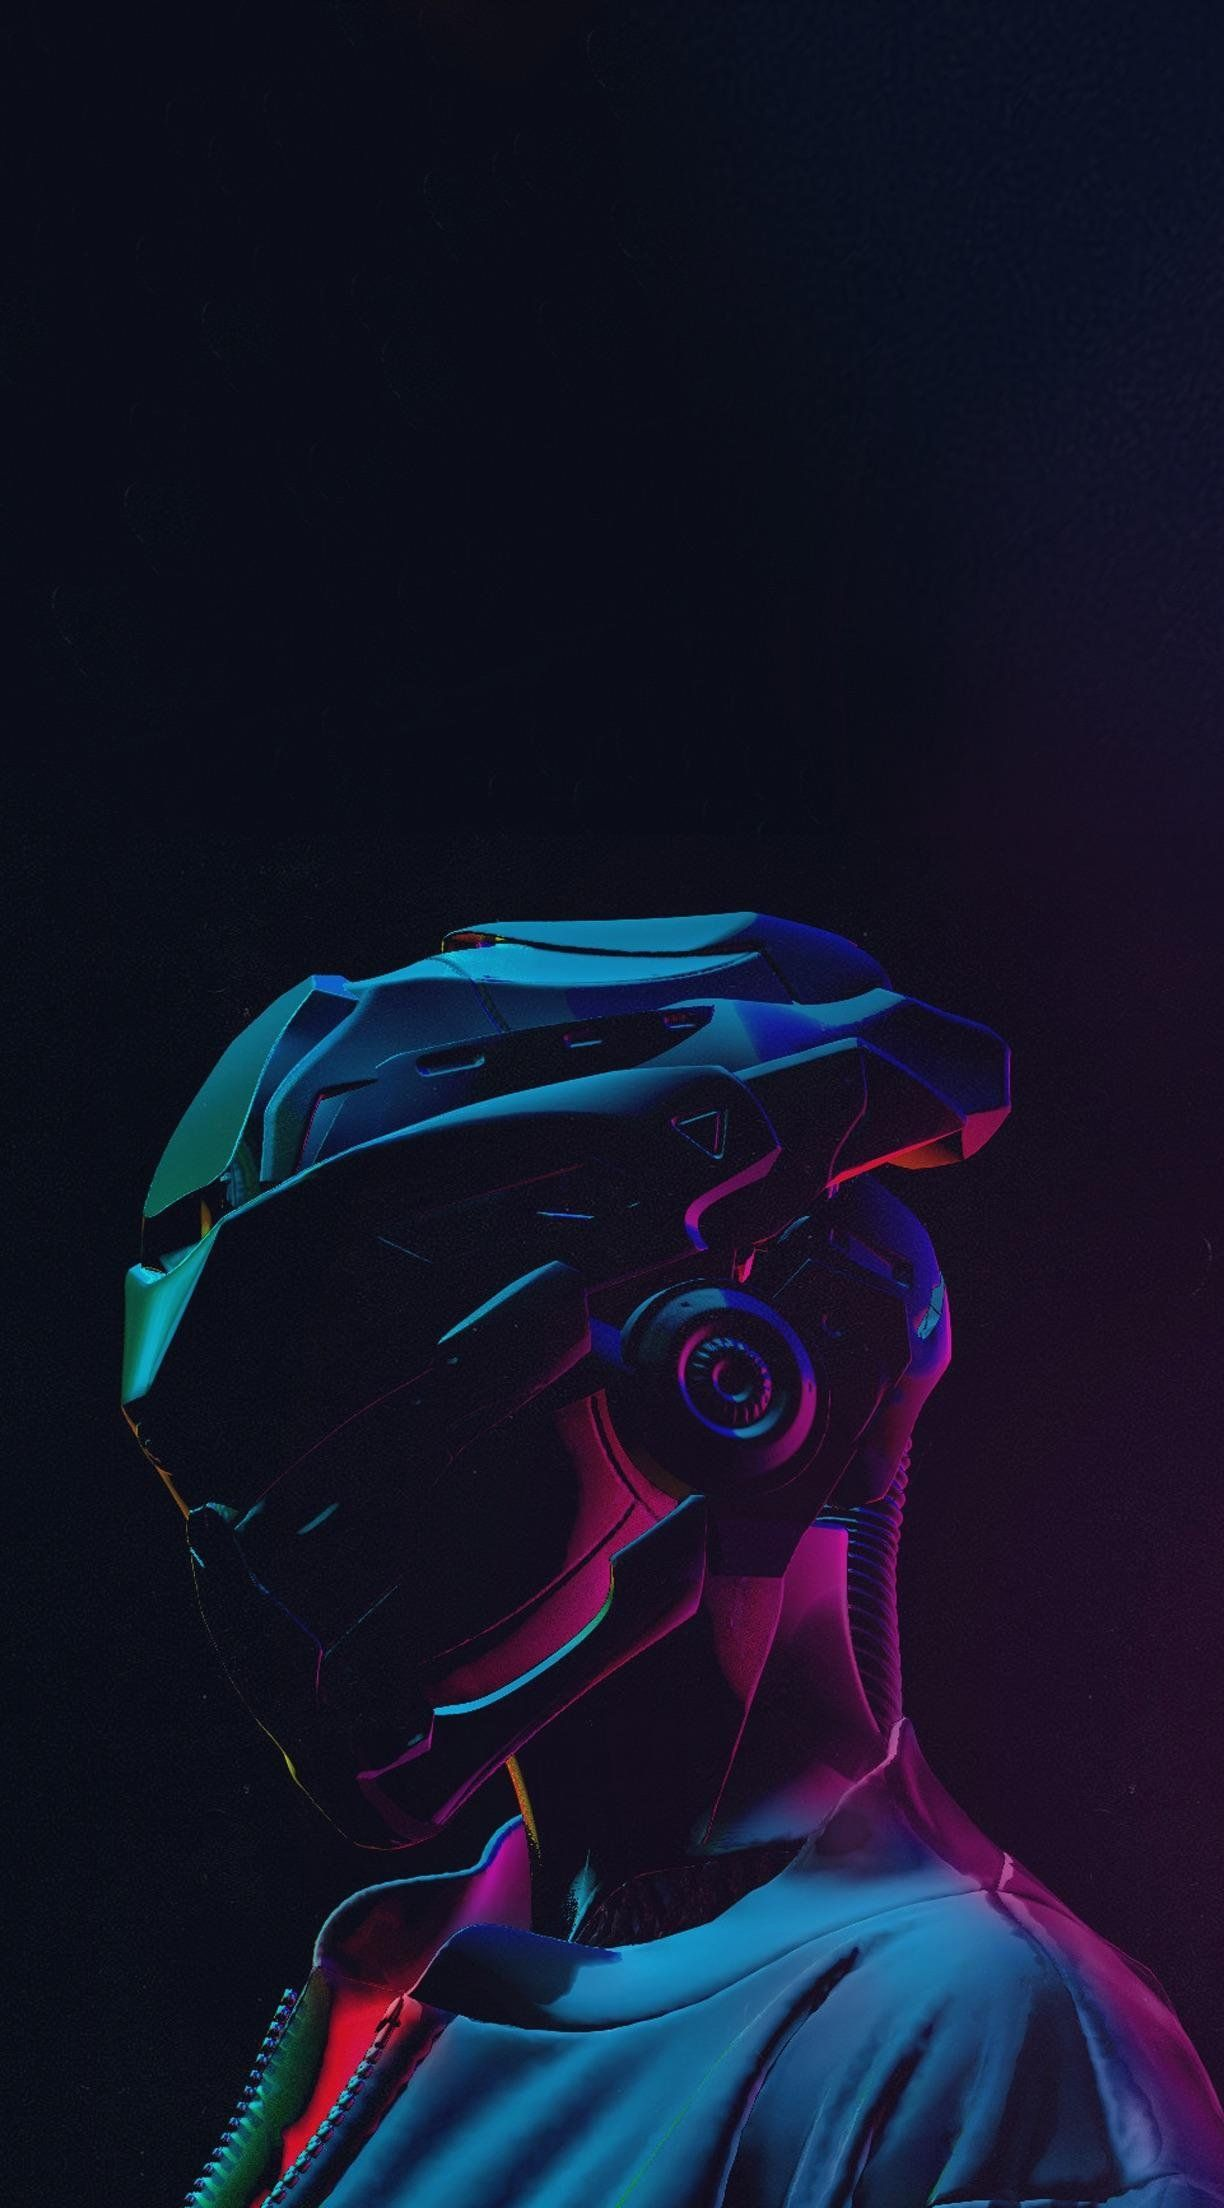 Cyberpunk 2077 Wallpapers - Top Free Cyberpunk 2077 ...